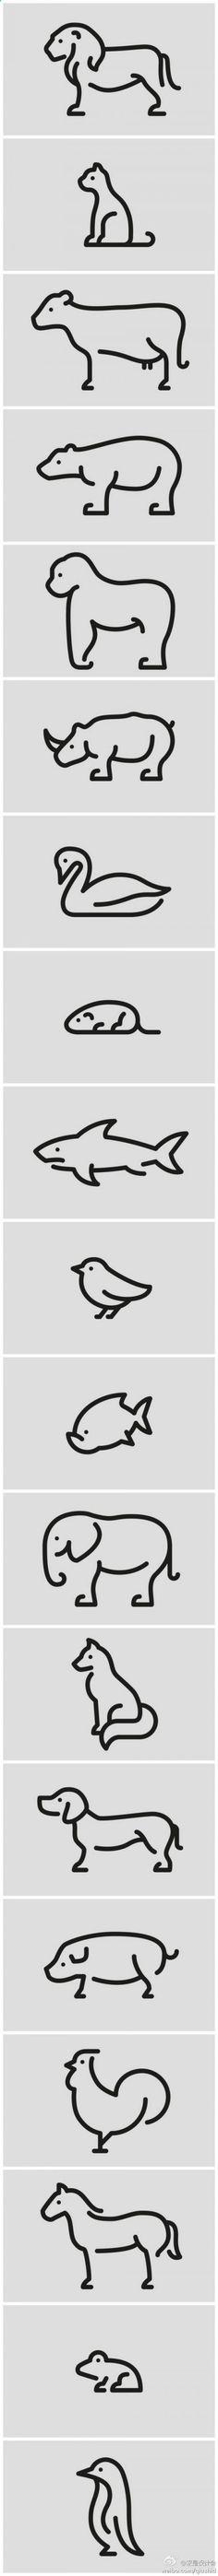 Ways to draw different animals